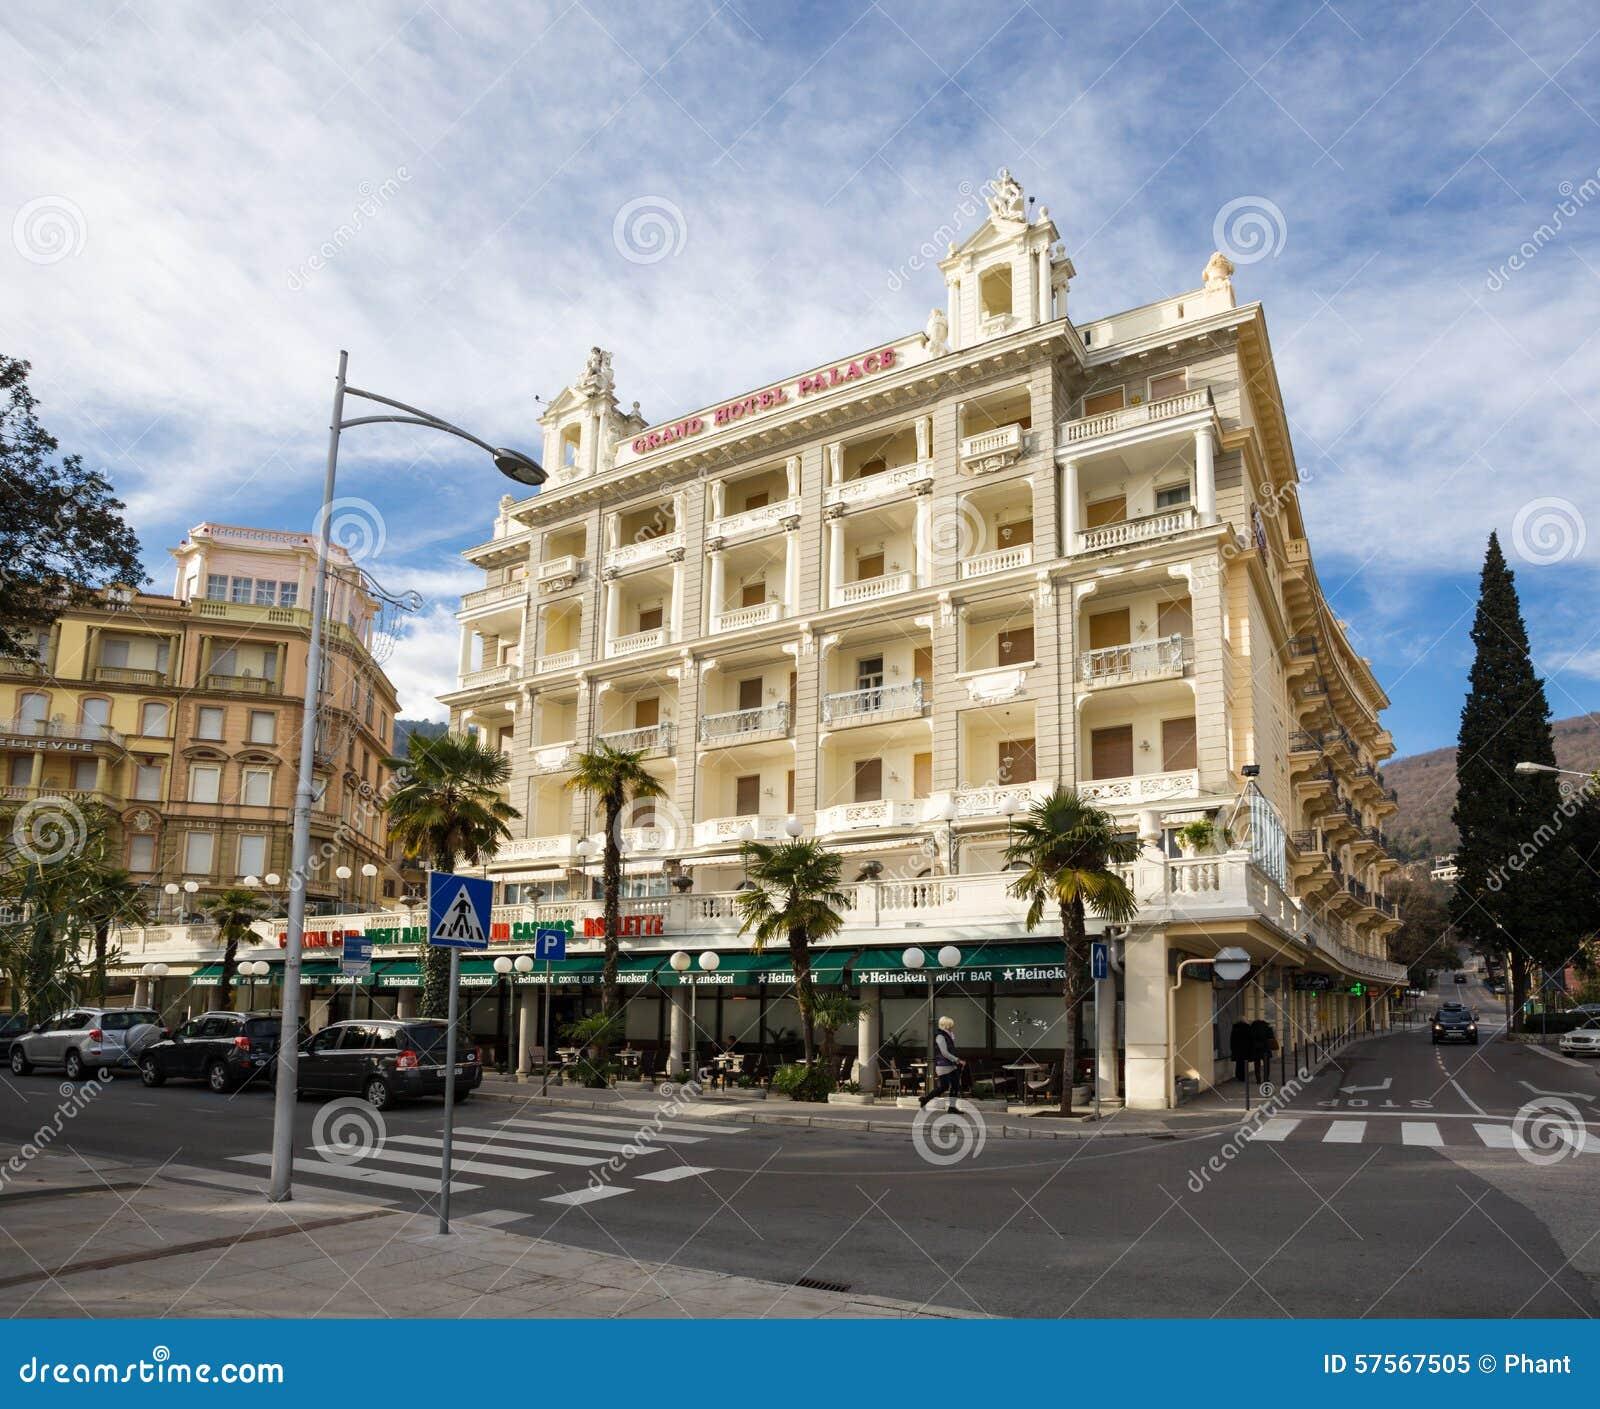 Exterior view of hotel palace bellevue opatija croatia for Design hotel opatija croatia